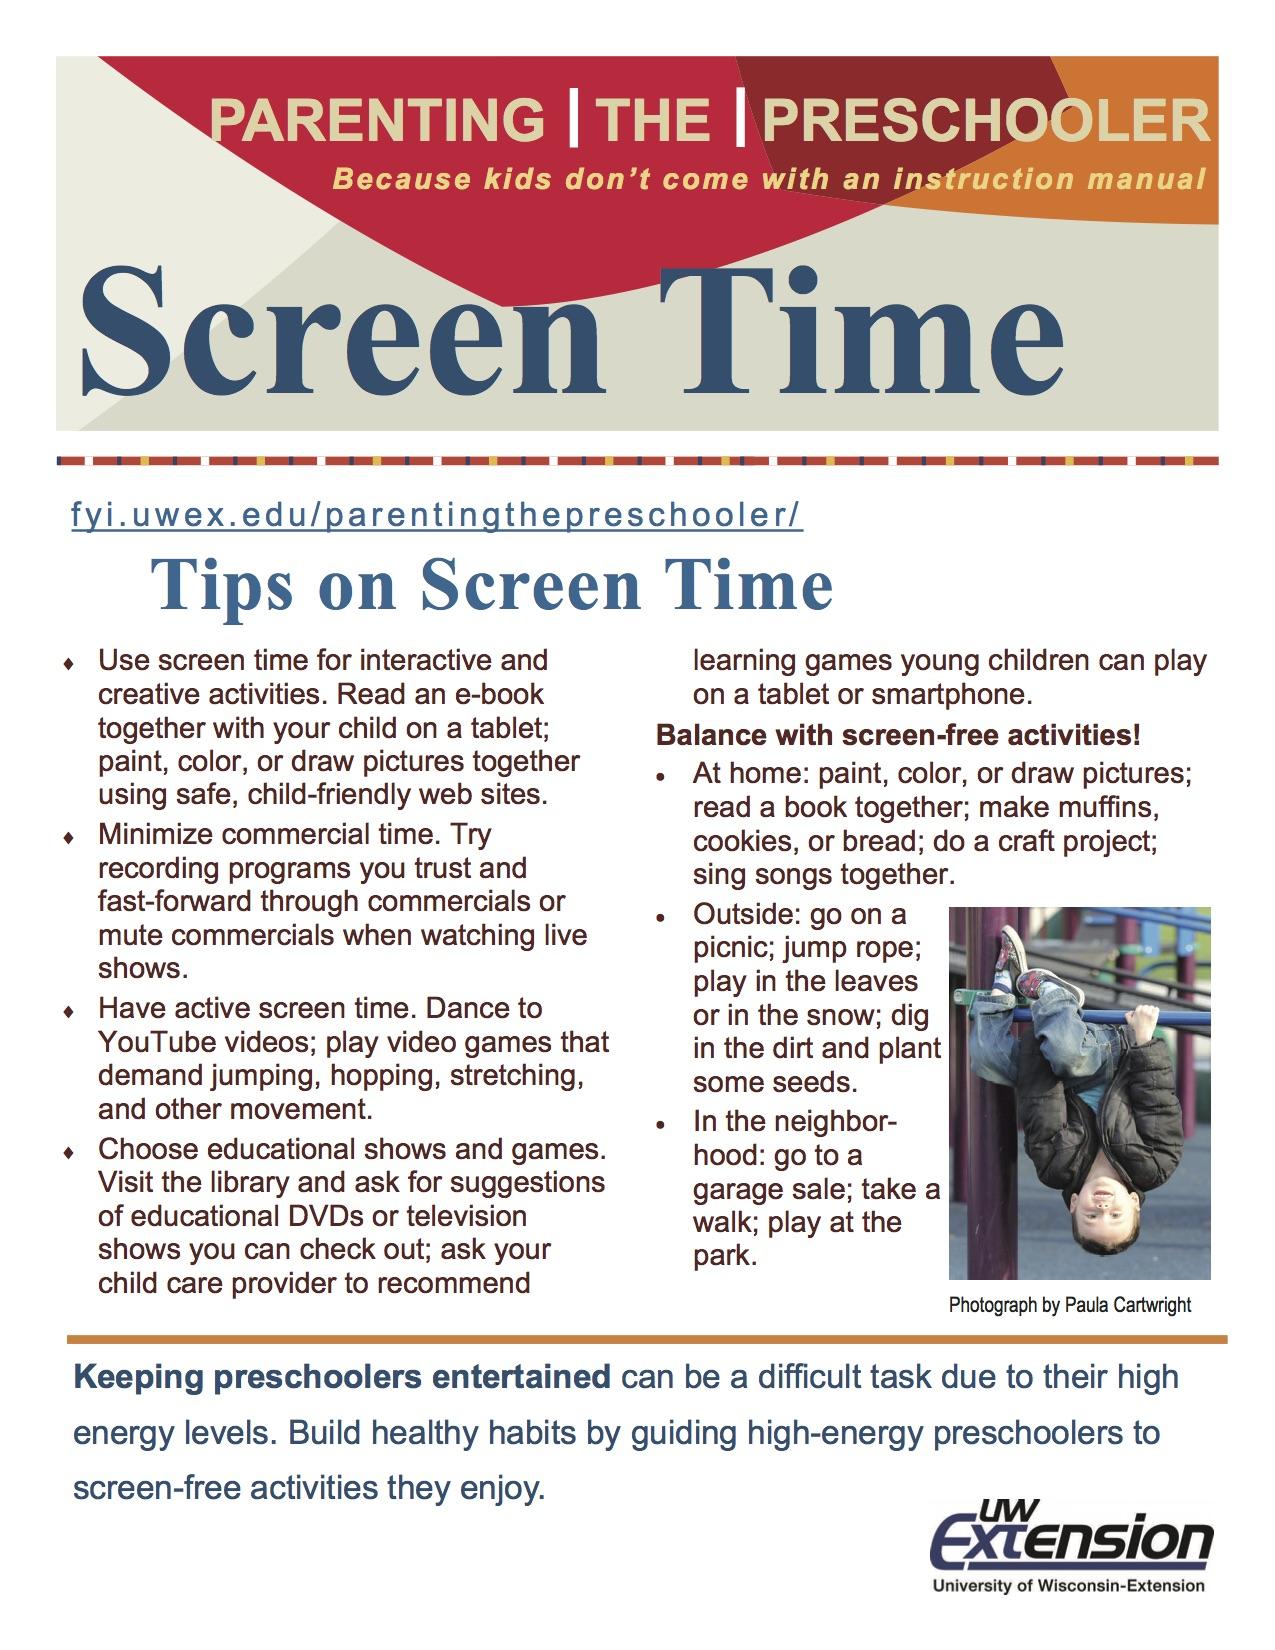 PtP-Screen-Time